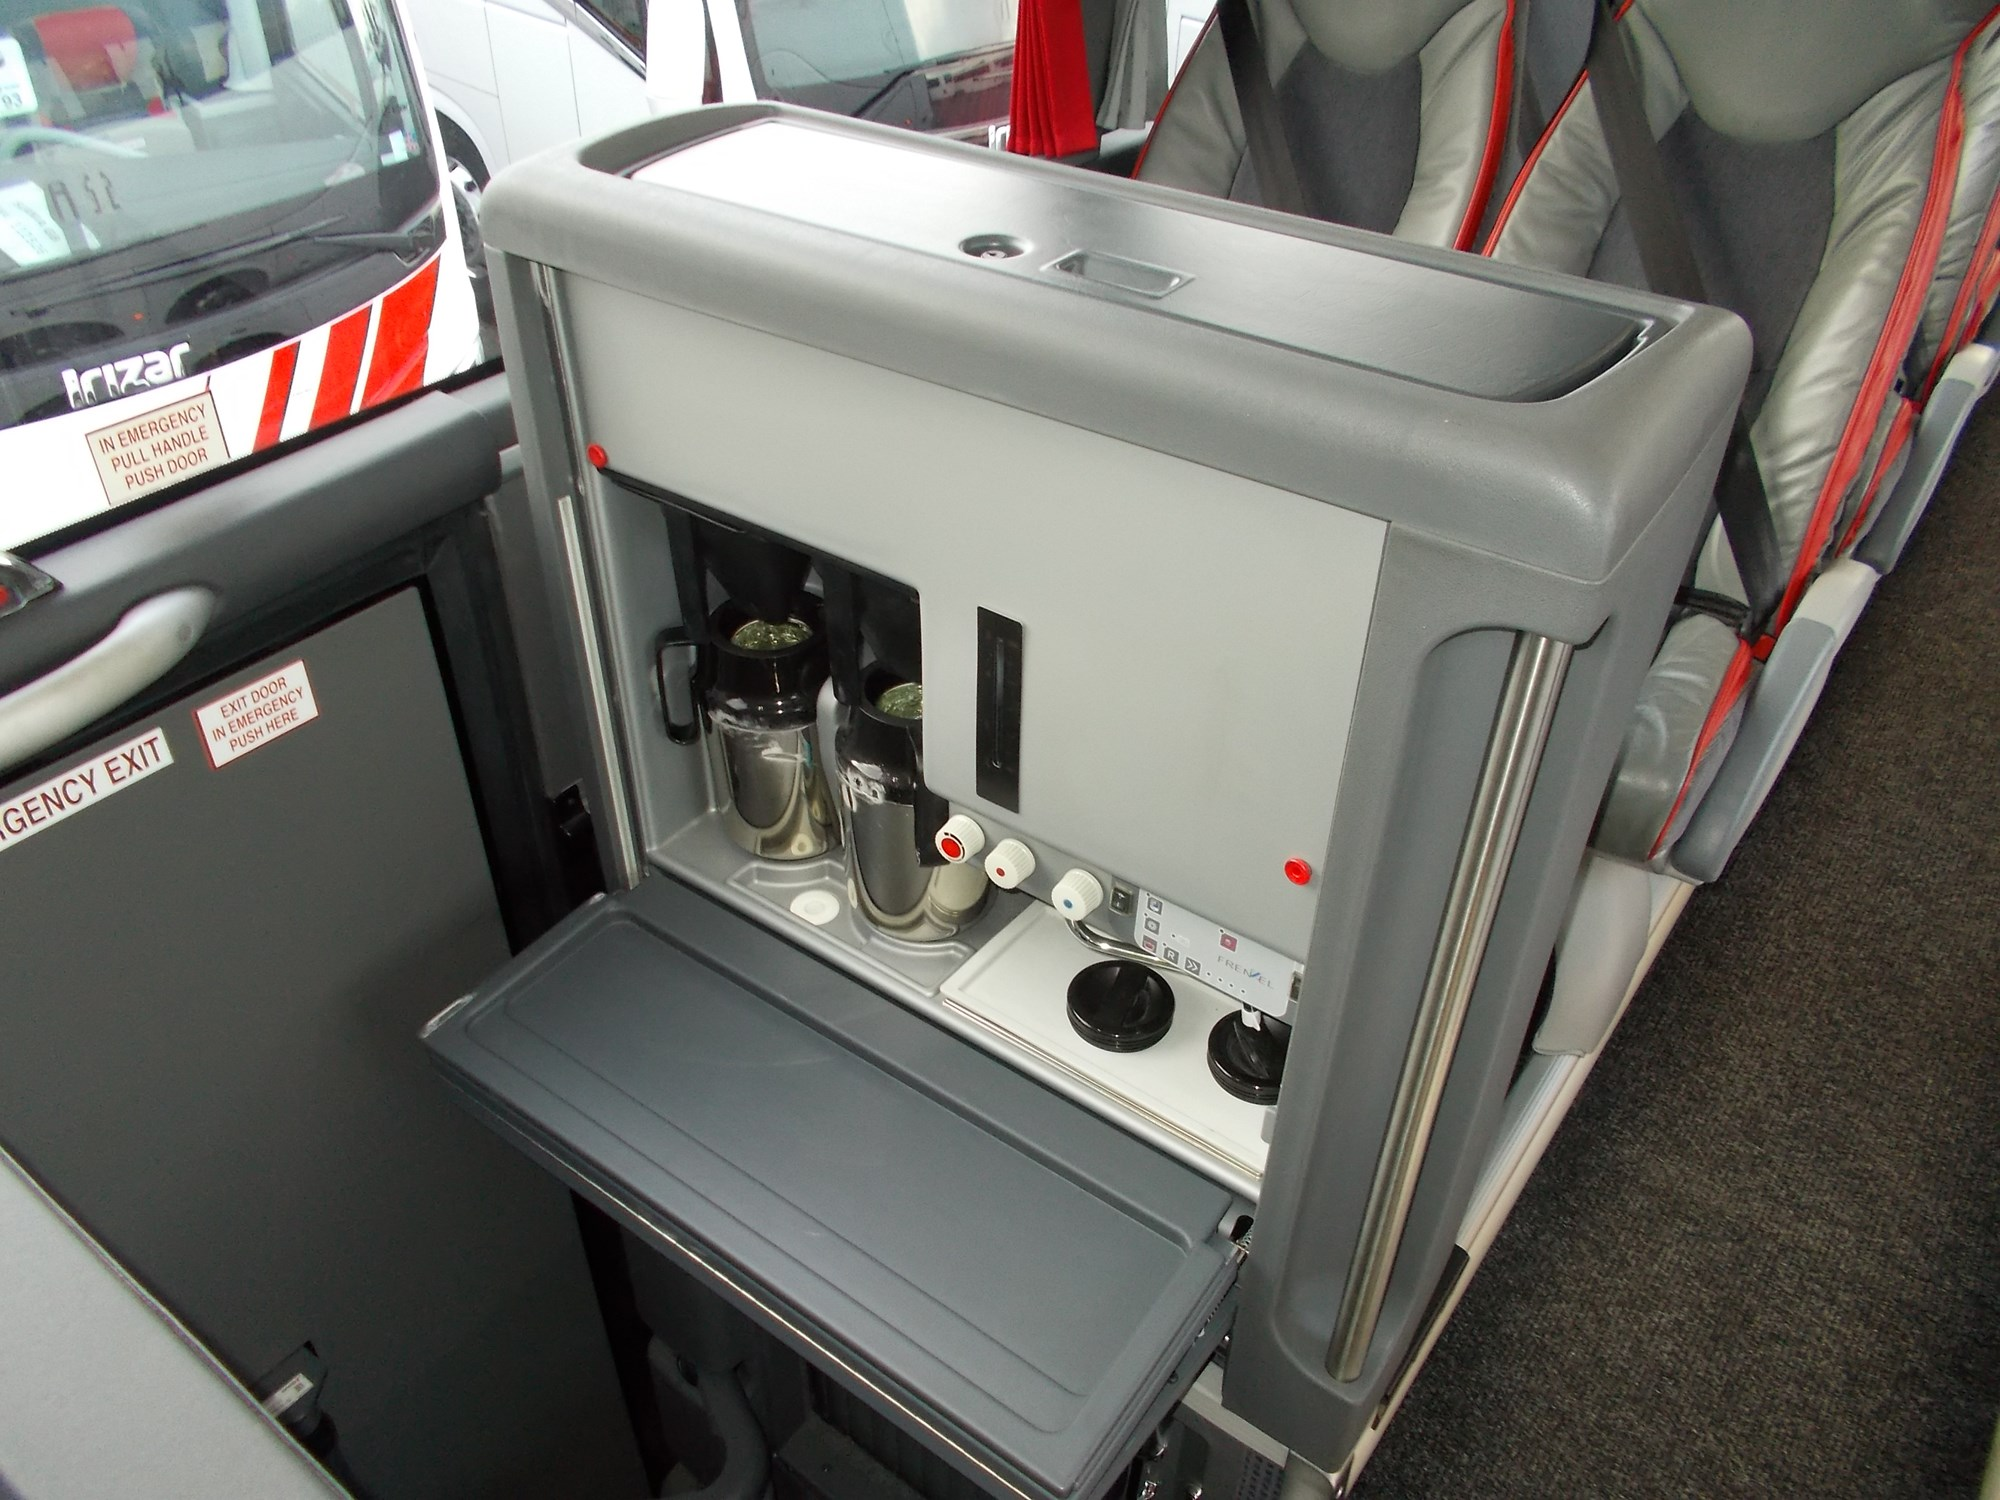 2016 Scania K410 Irizar i6 - Image 7